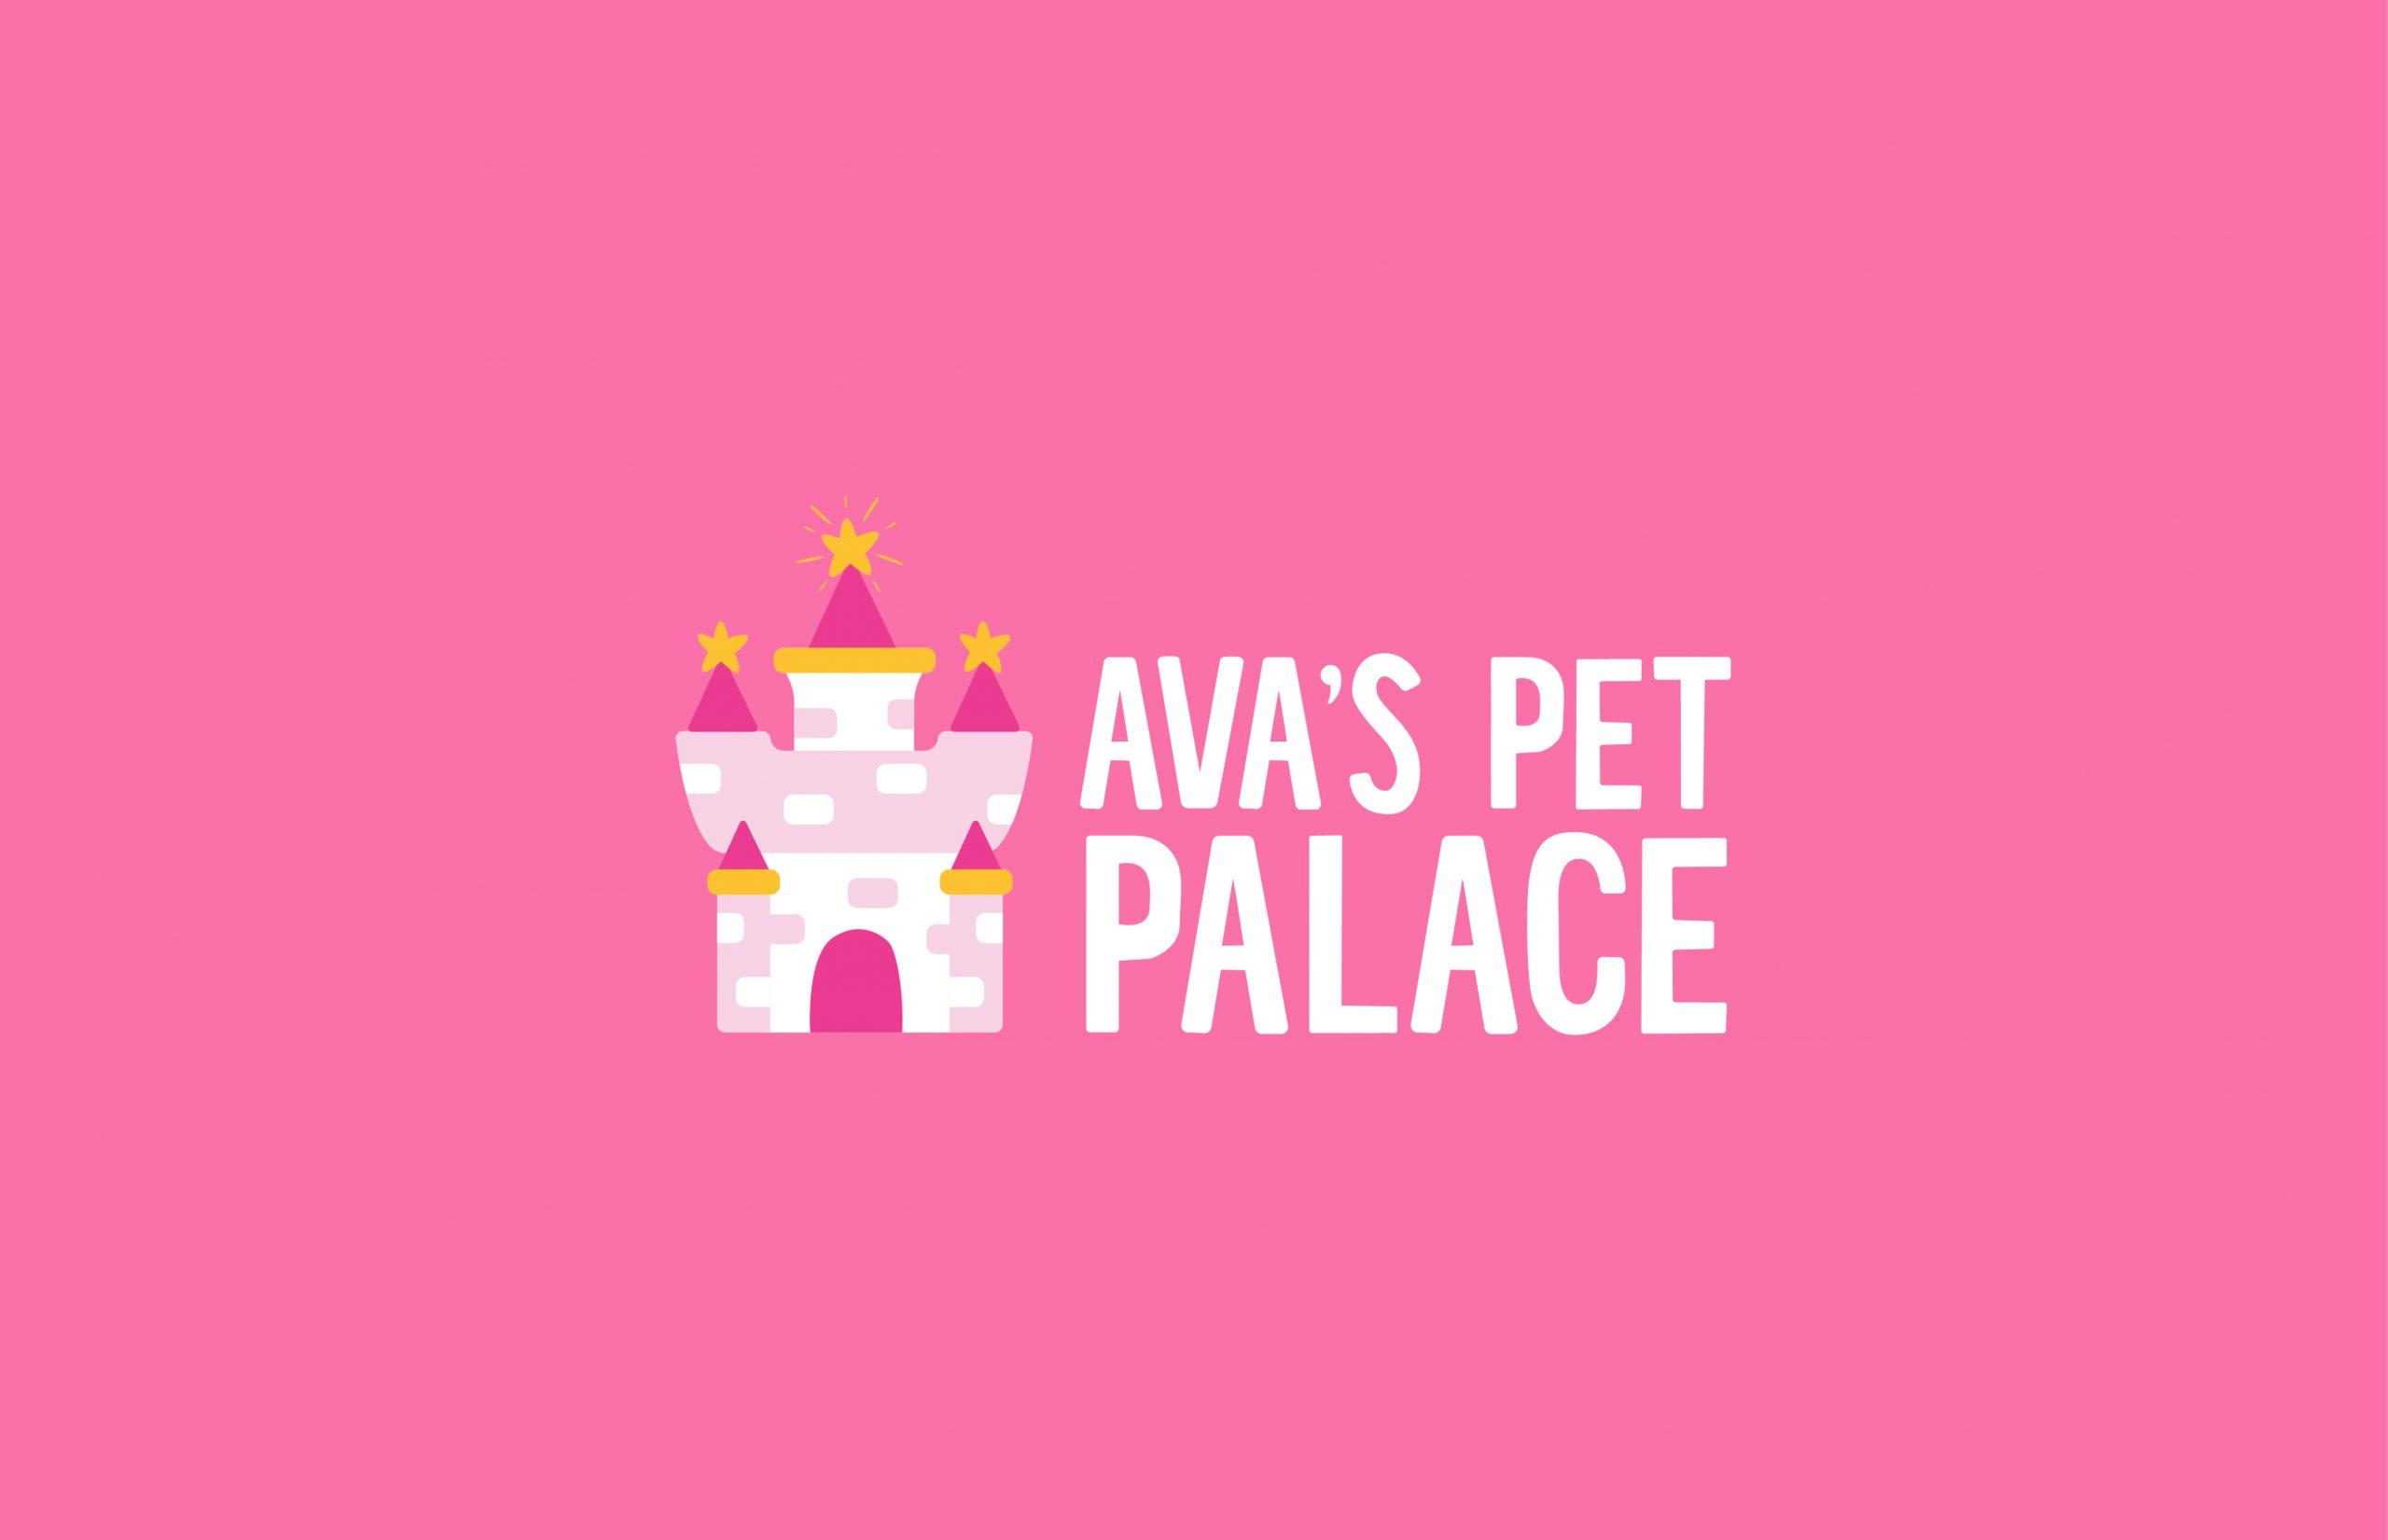 Ava's Pet Palace logo